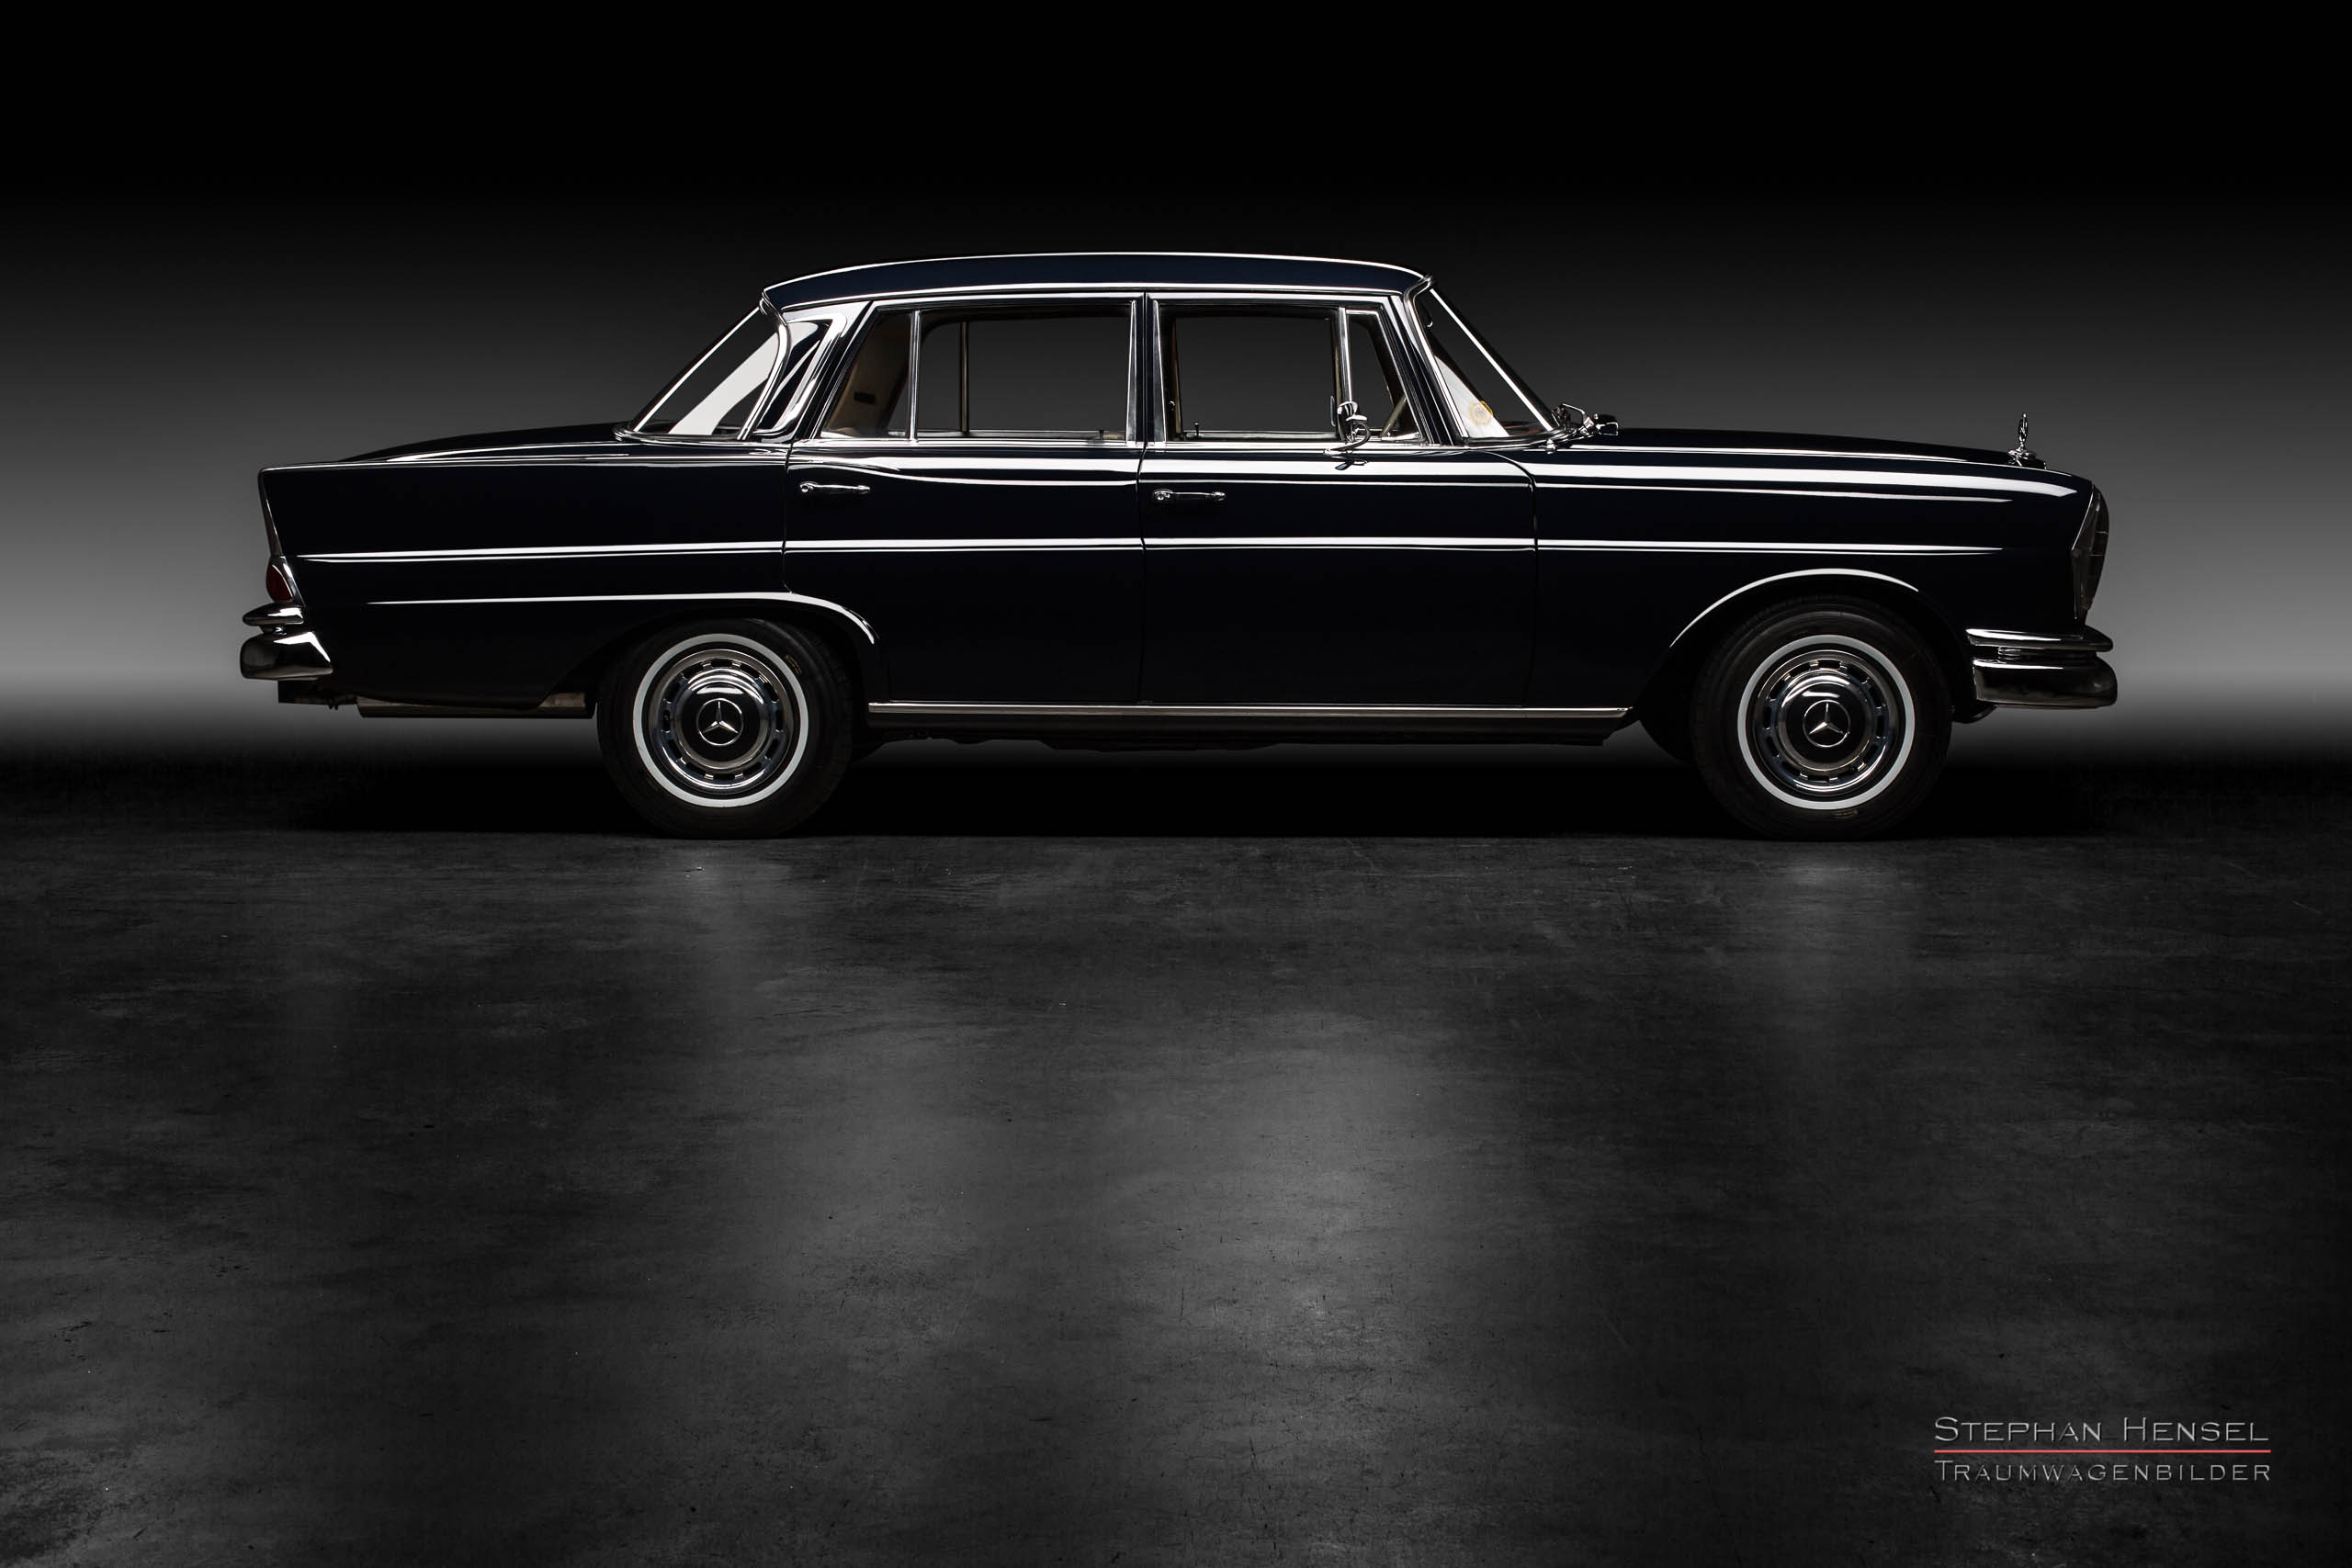 Mercedes-Benz 230 S, Seitenansicht im Studio, Autofotografie: Stephan Hensel, Hamburg, Oldtimerfotograf, Oldtimerfotografie